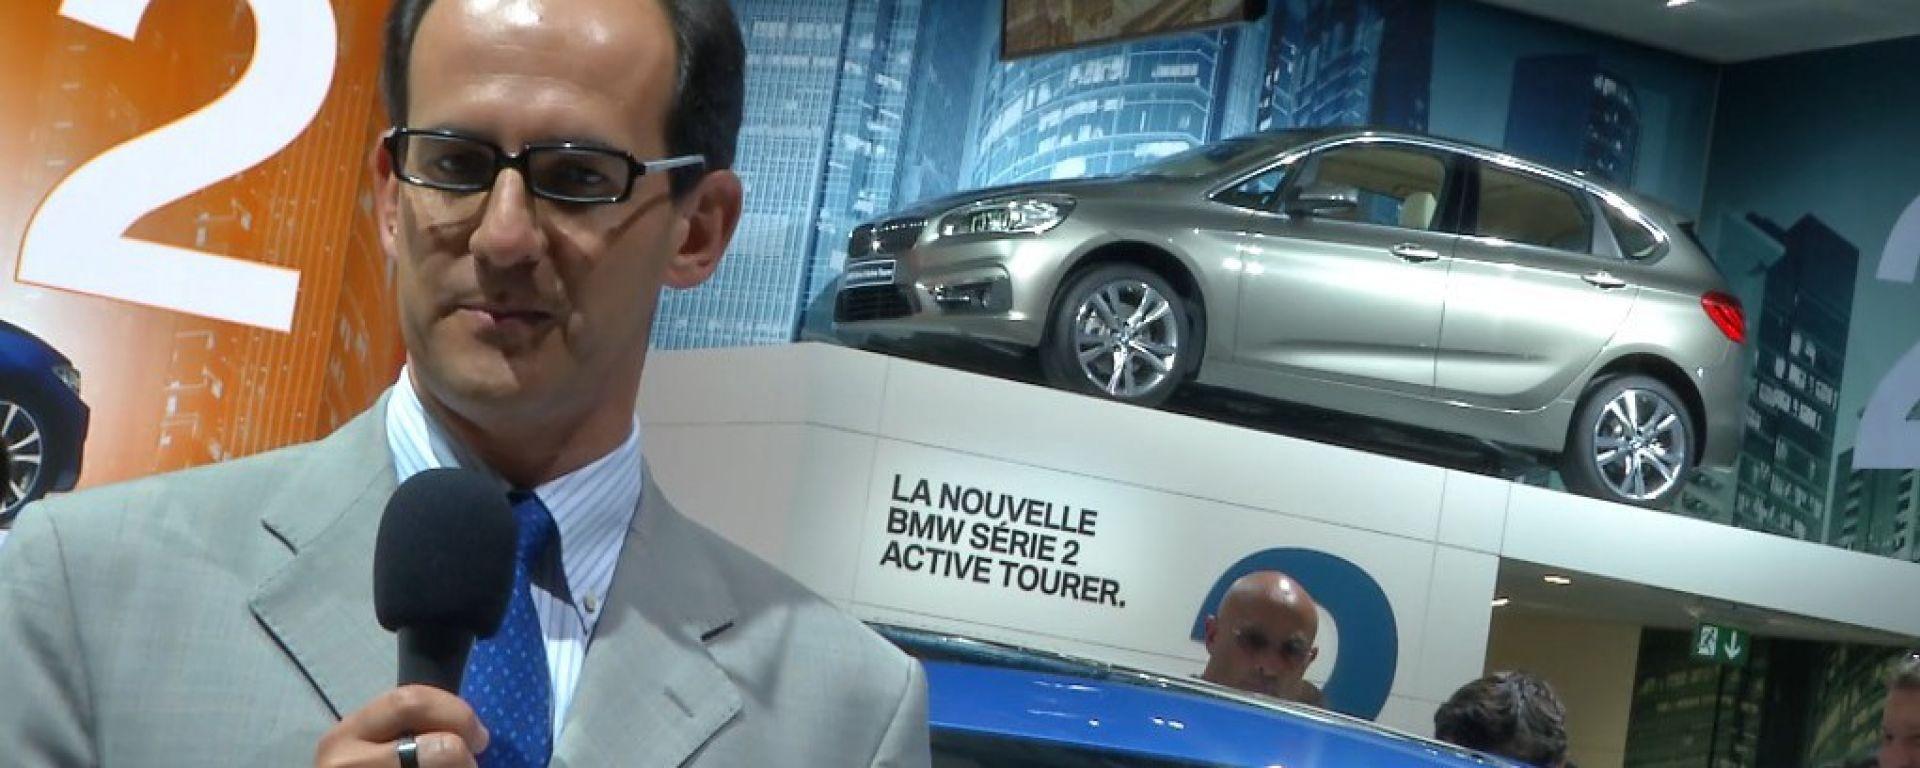 Salone di Parigi 2014, lo stand BMW